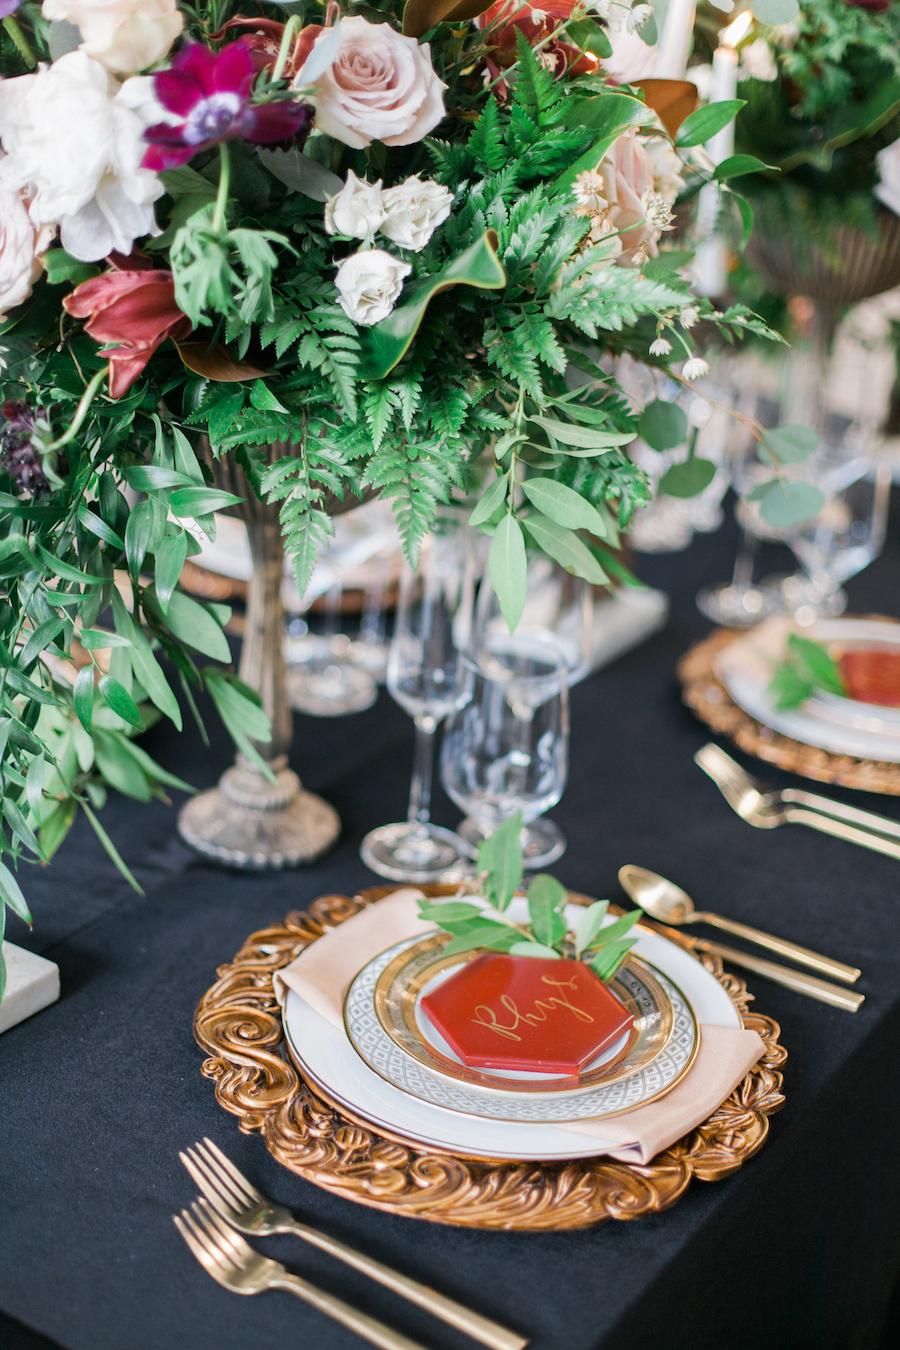 burlap-and-bordeux-steven-leyva-photography-villa-and-vine-wedding-styled-shoot8.jpg